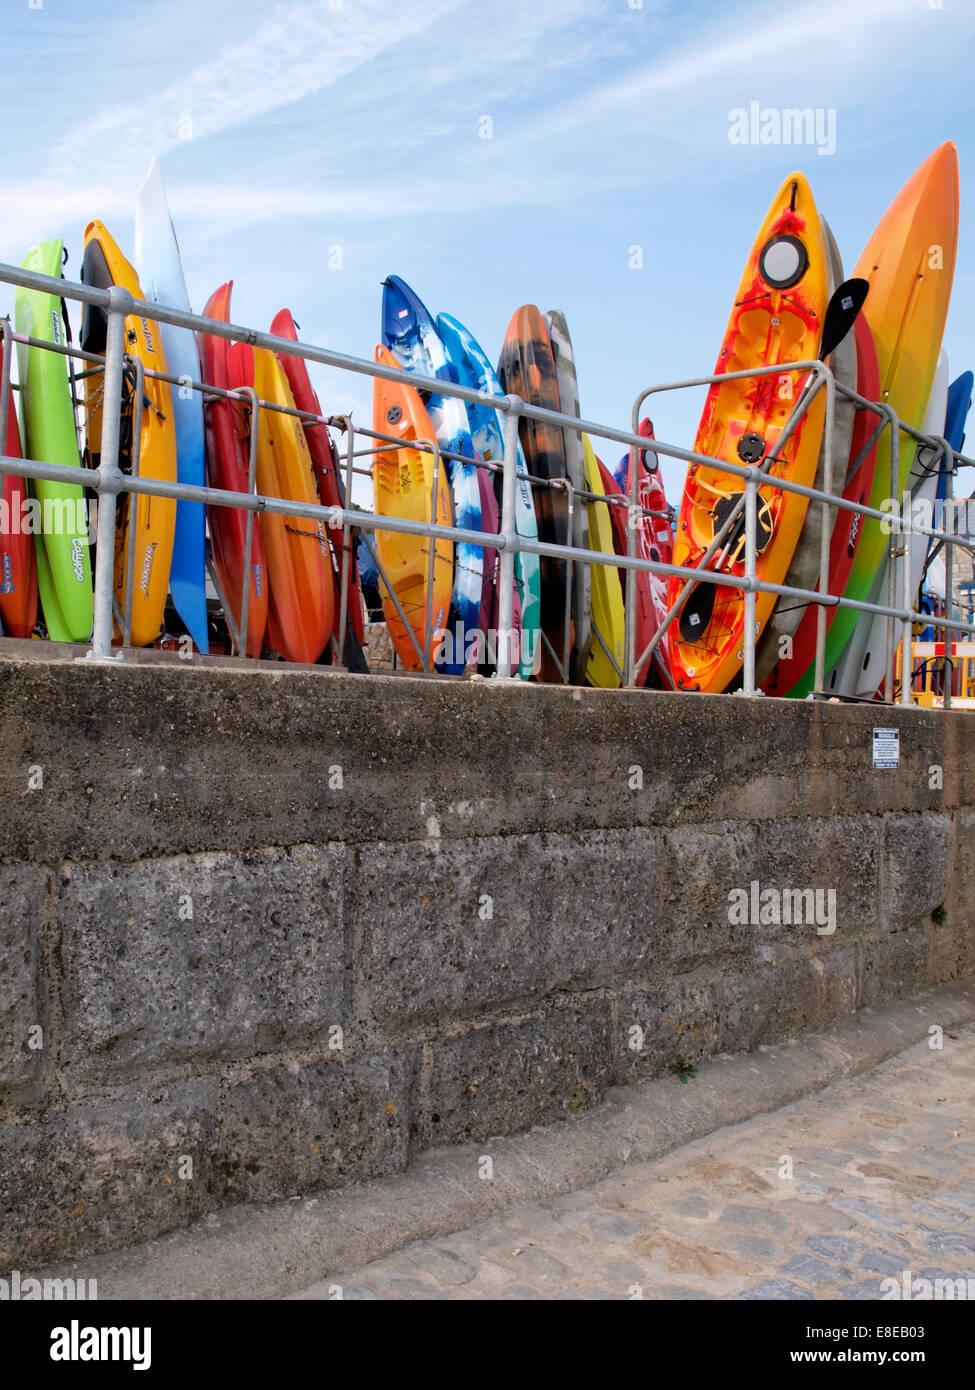 Colourful sit-on Kayaks for hire, Lyme Regis, Dorset, UK - Stock Image